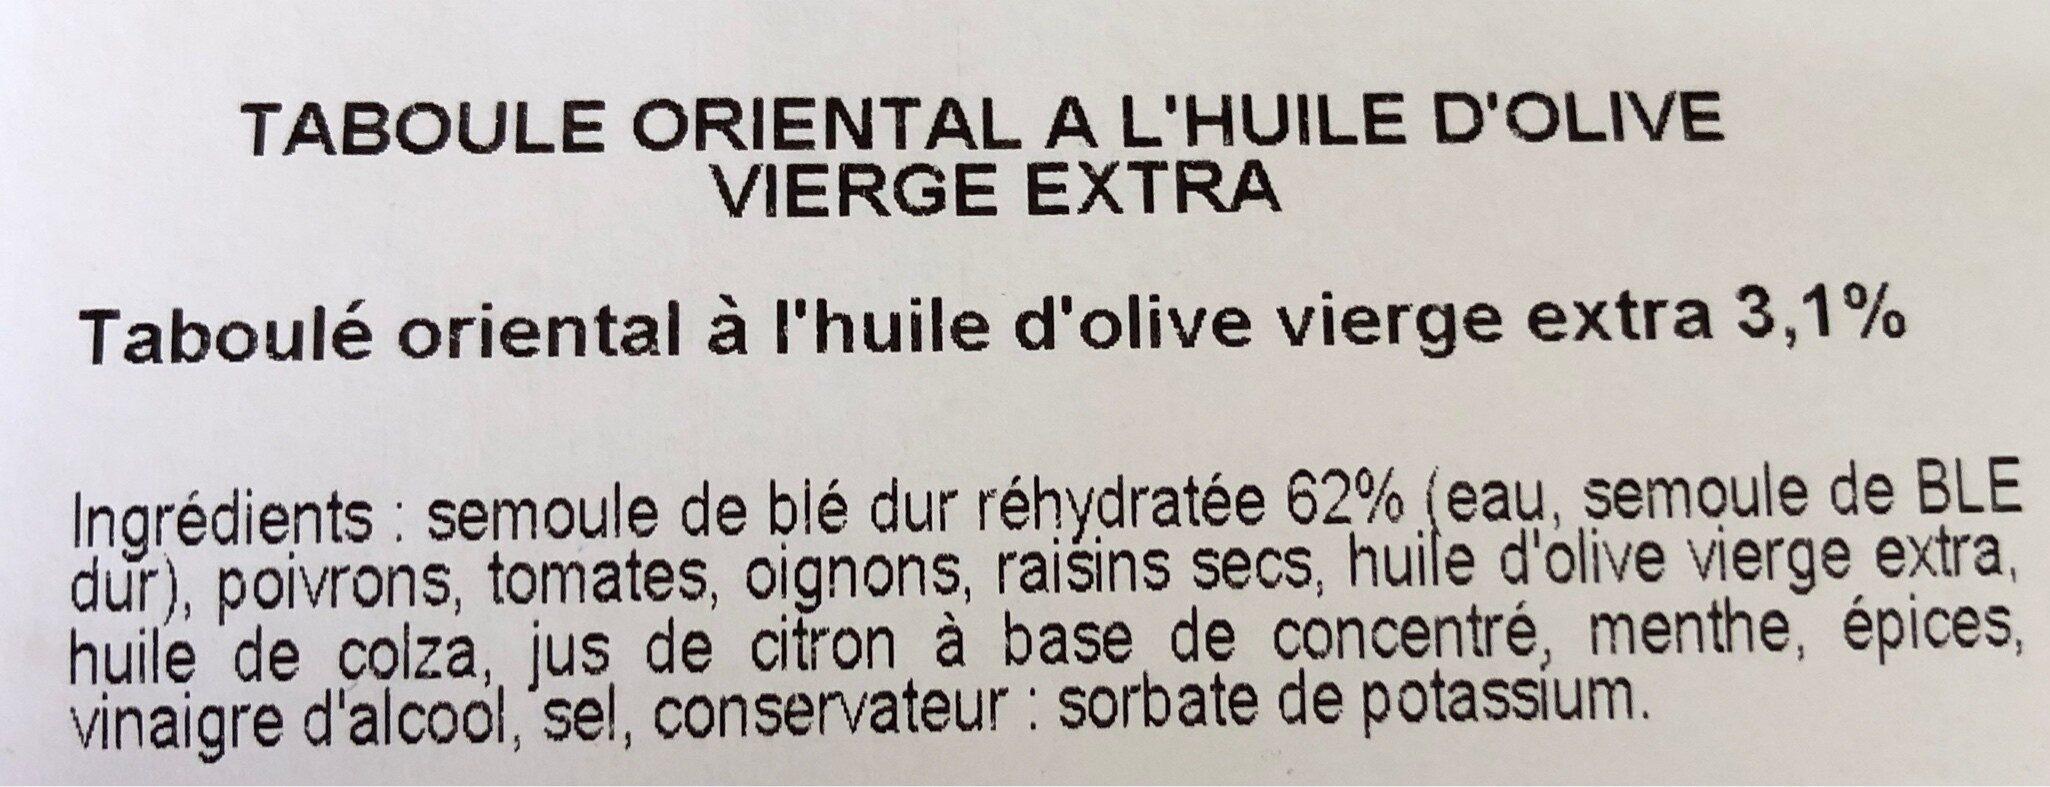 Taboule oriental a l'huile d'olive vierge extra - Ingrediënten - fr